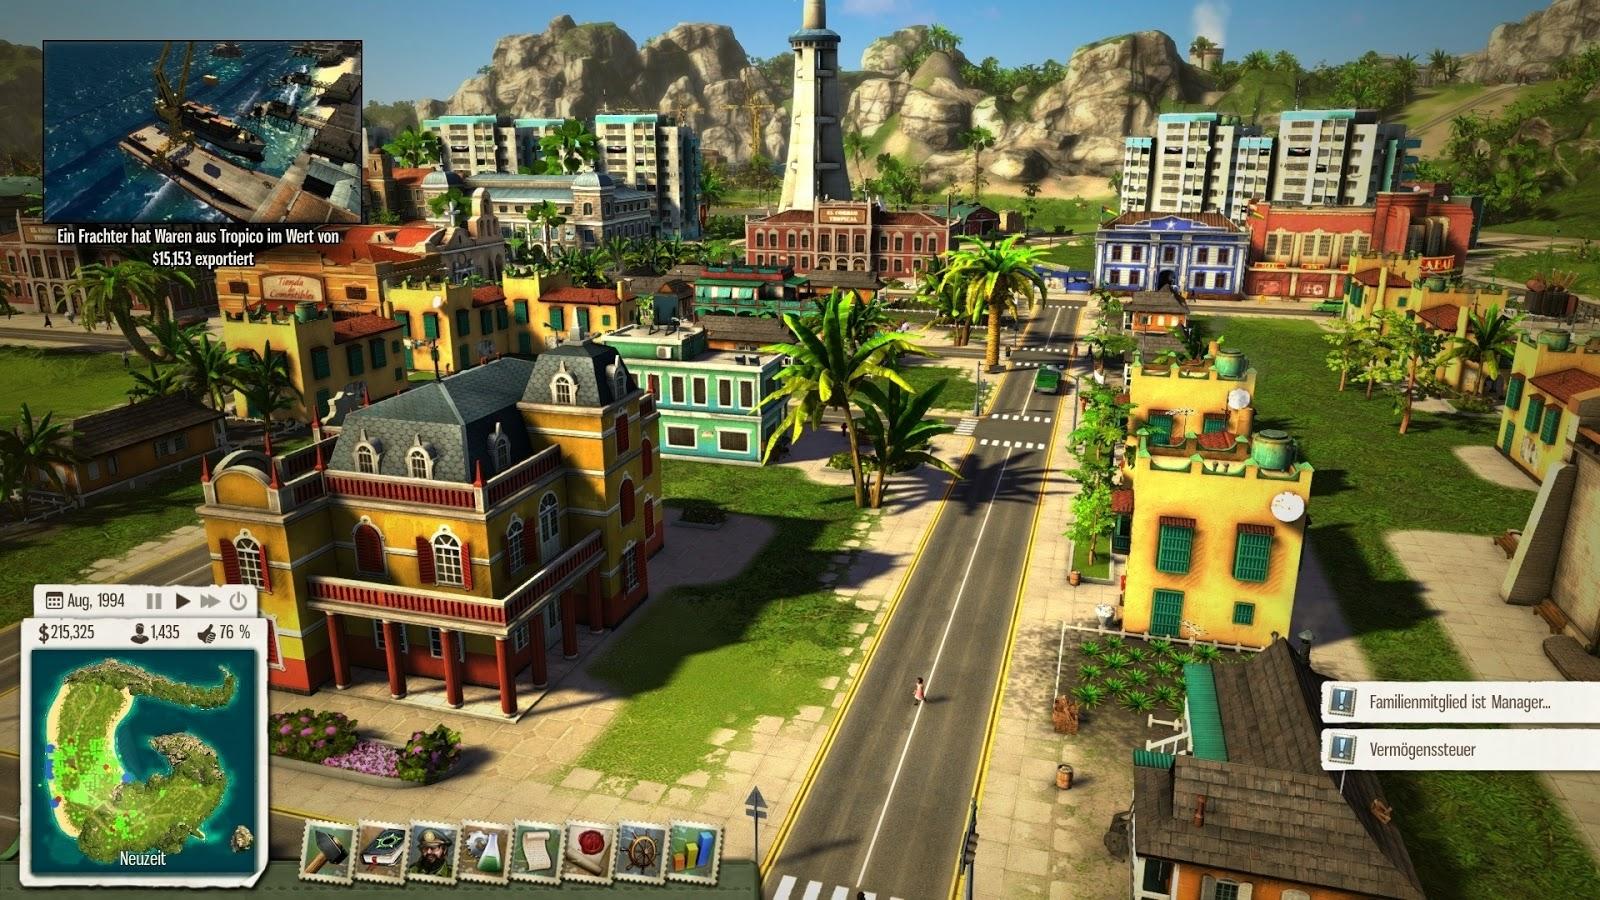 Tropico 5 - Best PC Games For Build City Simulations